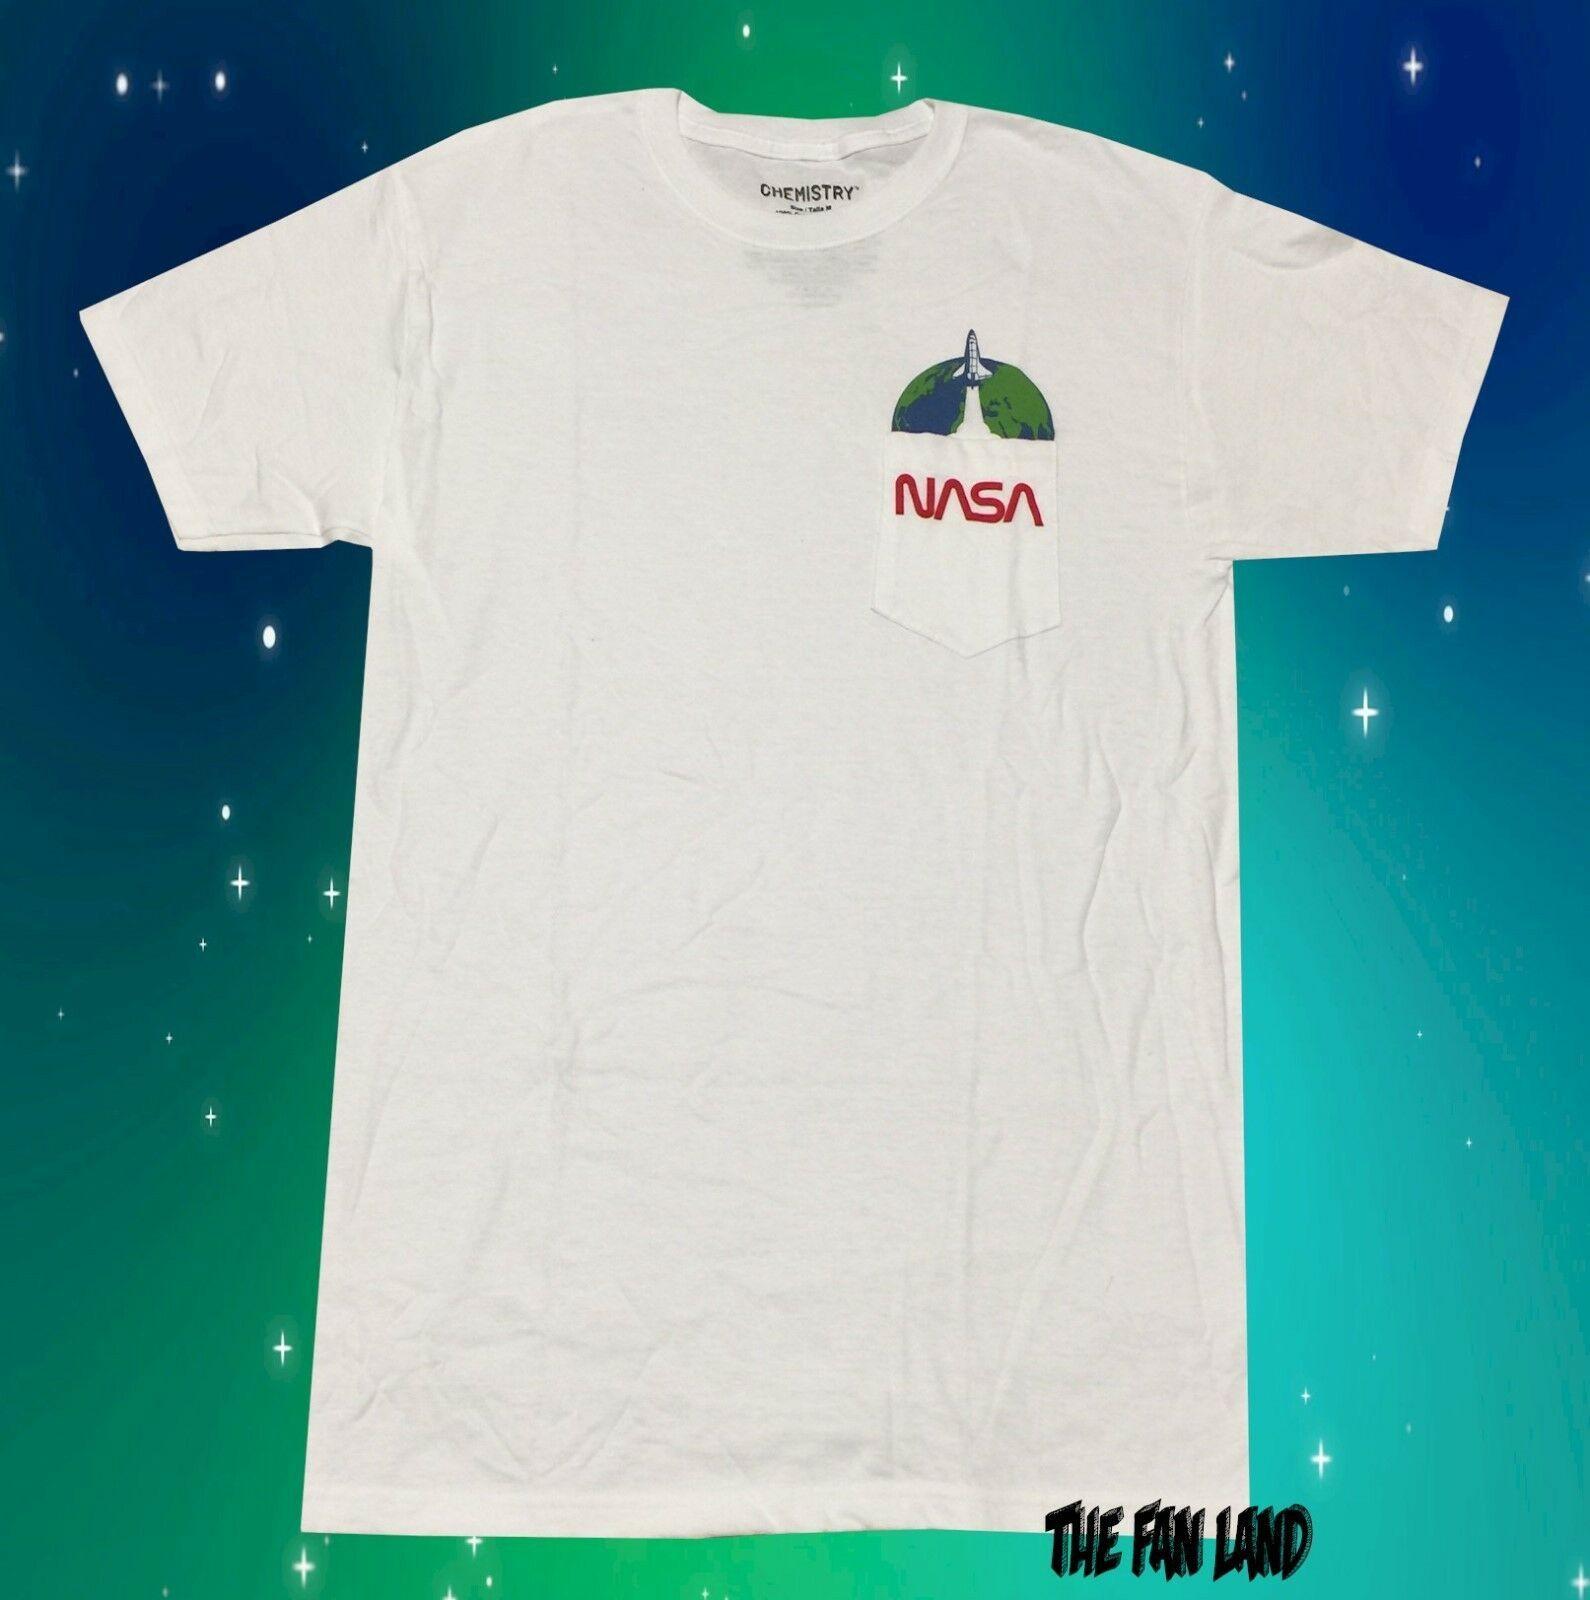 NASA Vintage Logo T Shirt Mens Space Astronaut Retro Style Classic Tee New Black